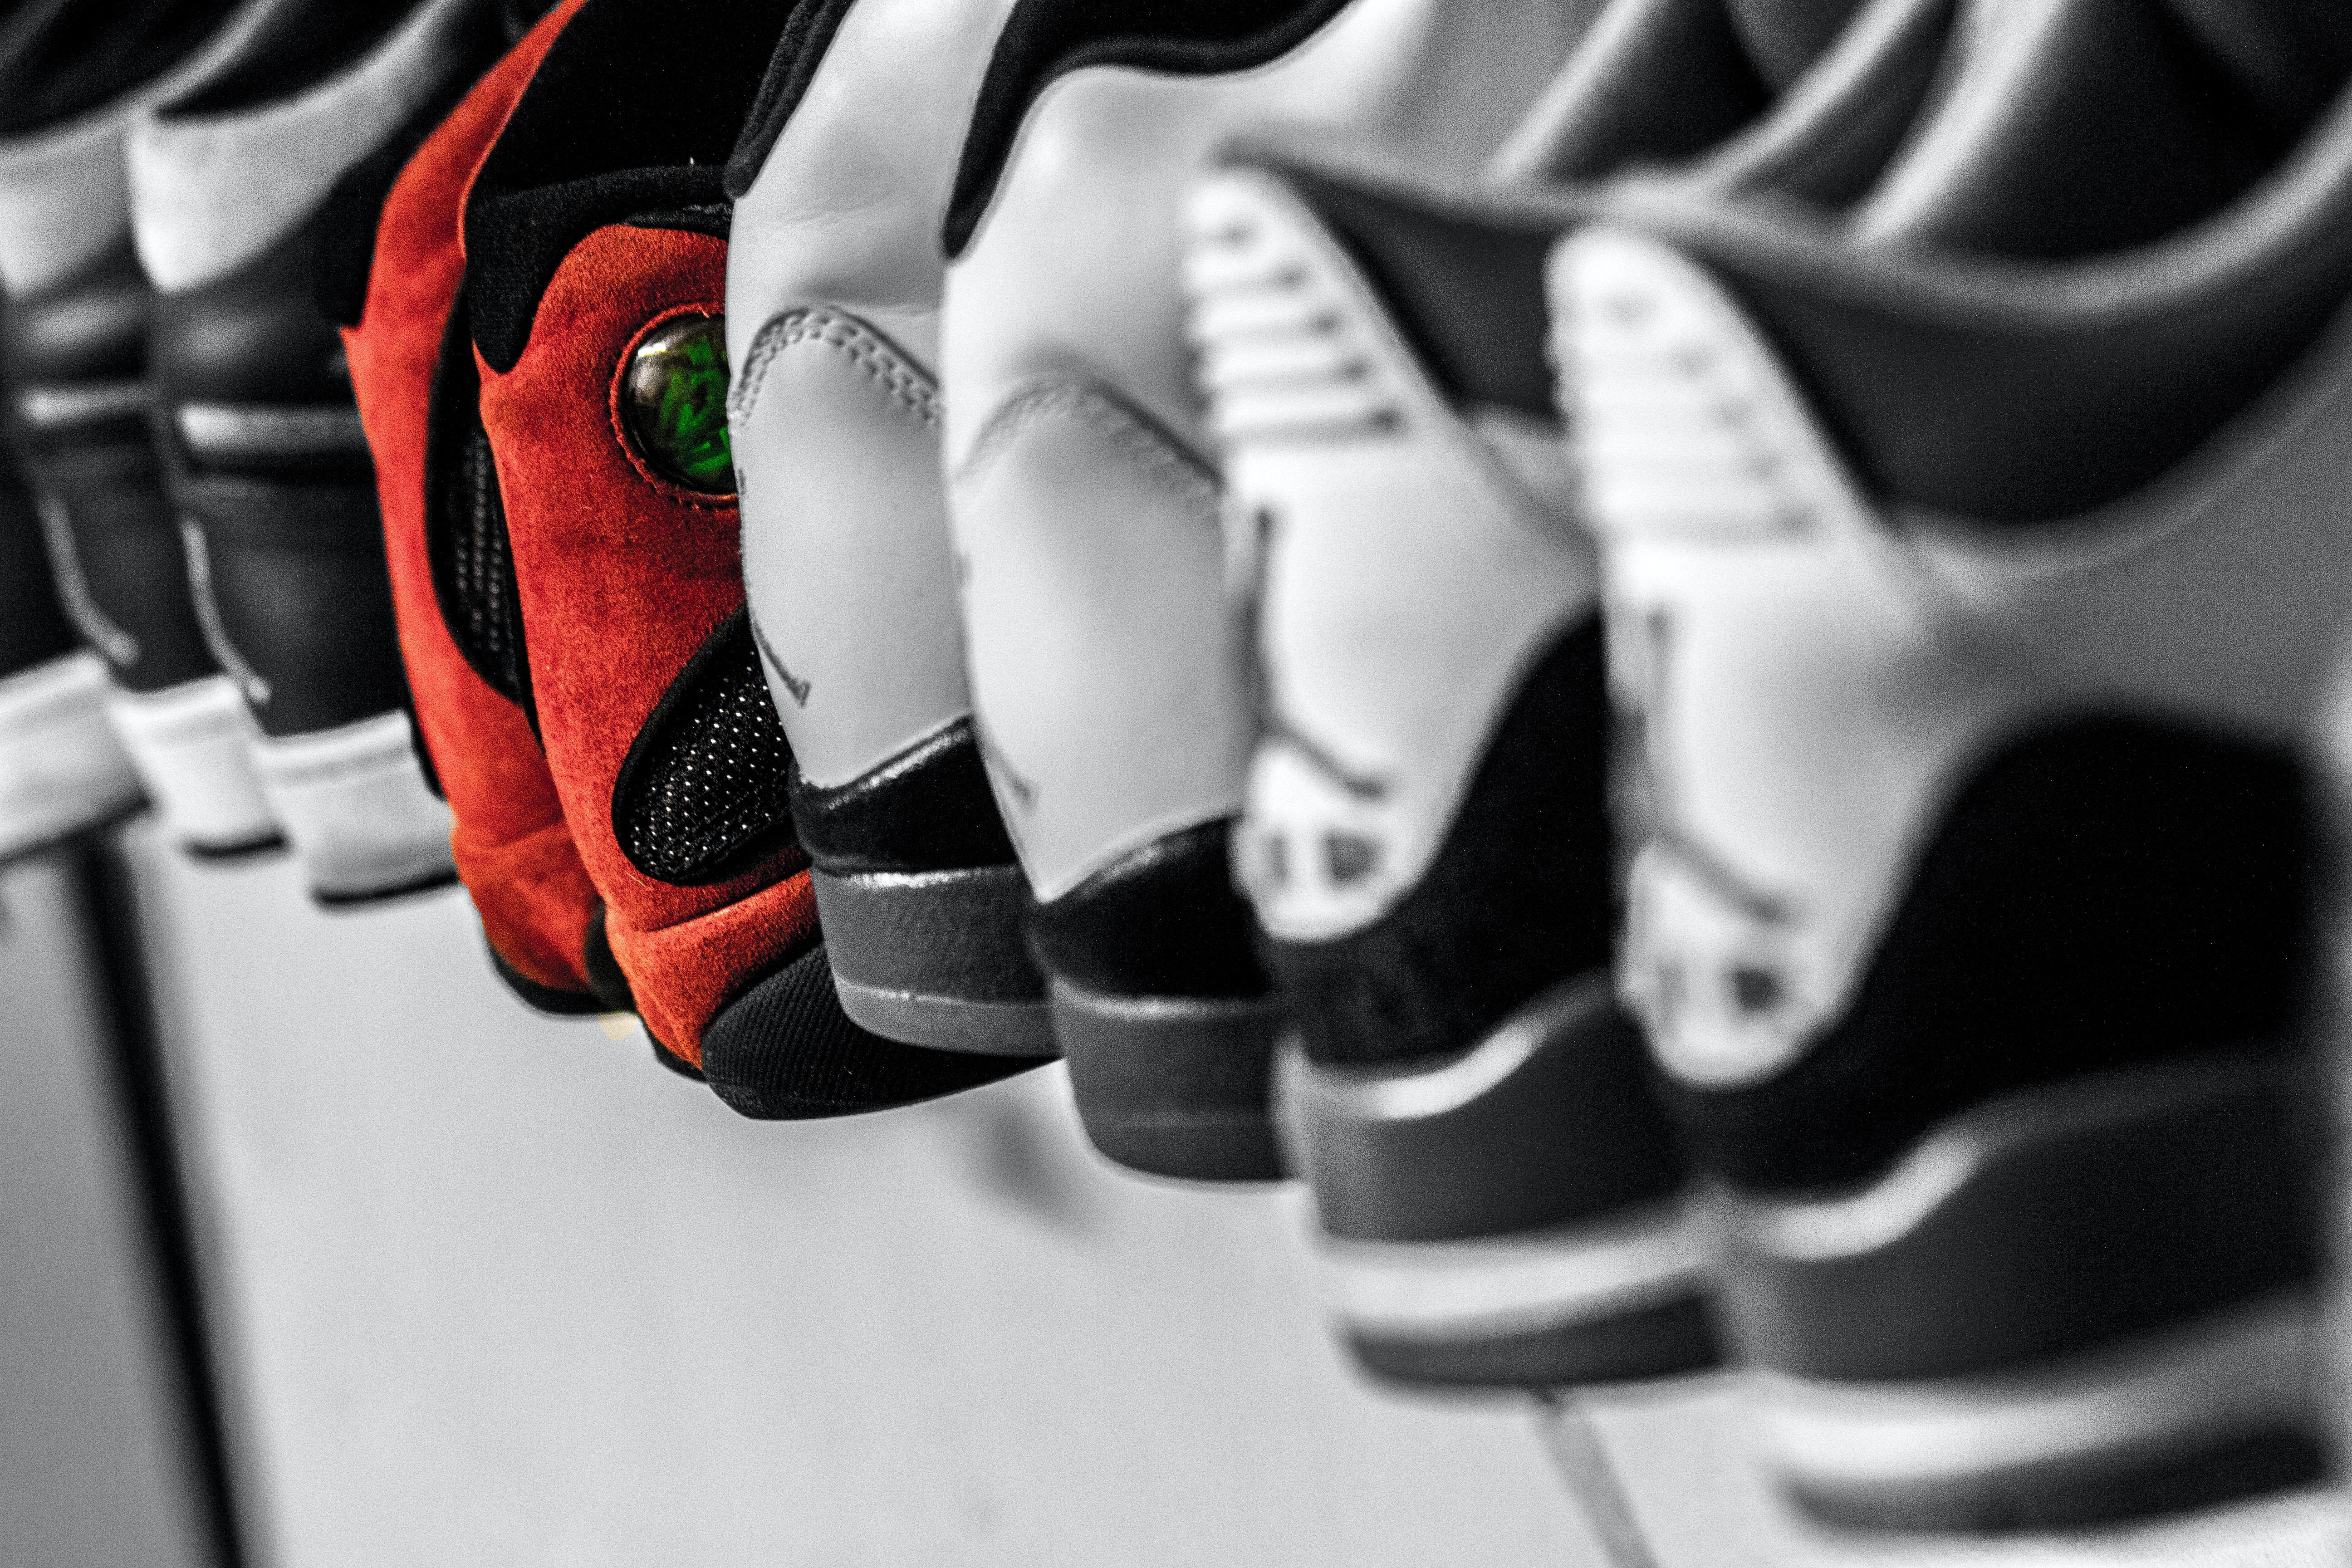 Black and white Air Jordan sneakers sit on either side of red Air Jordan sneakers